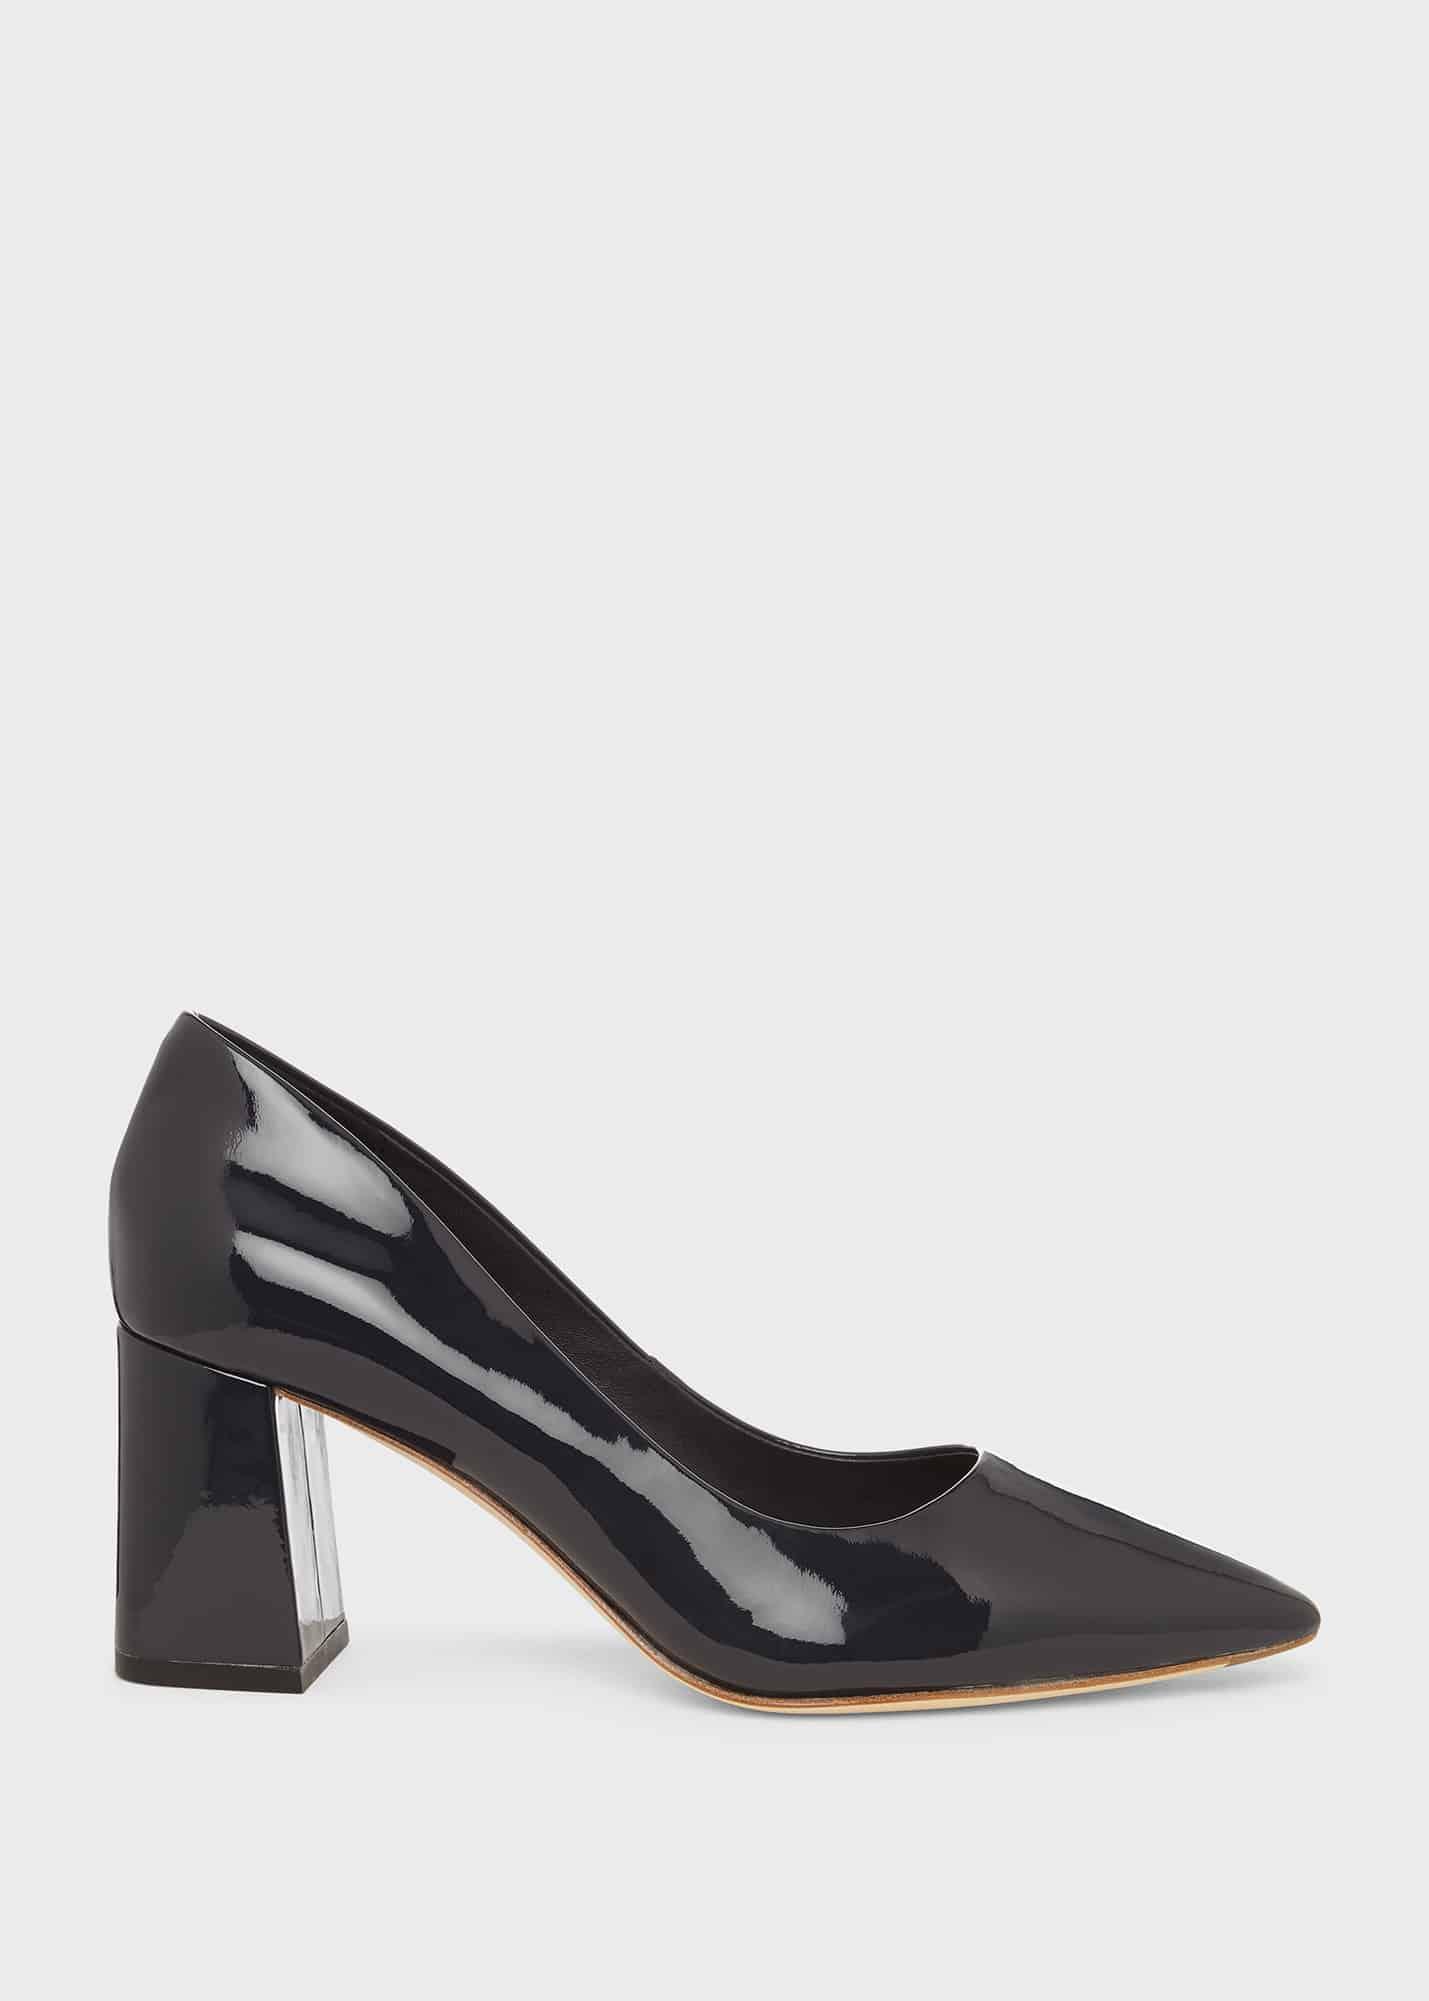 Hobbs Women Nicola Court Shoes